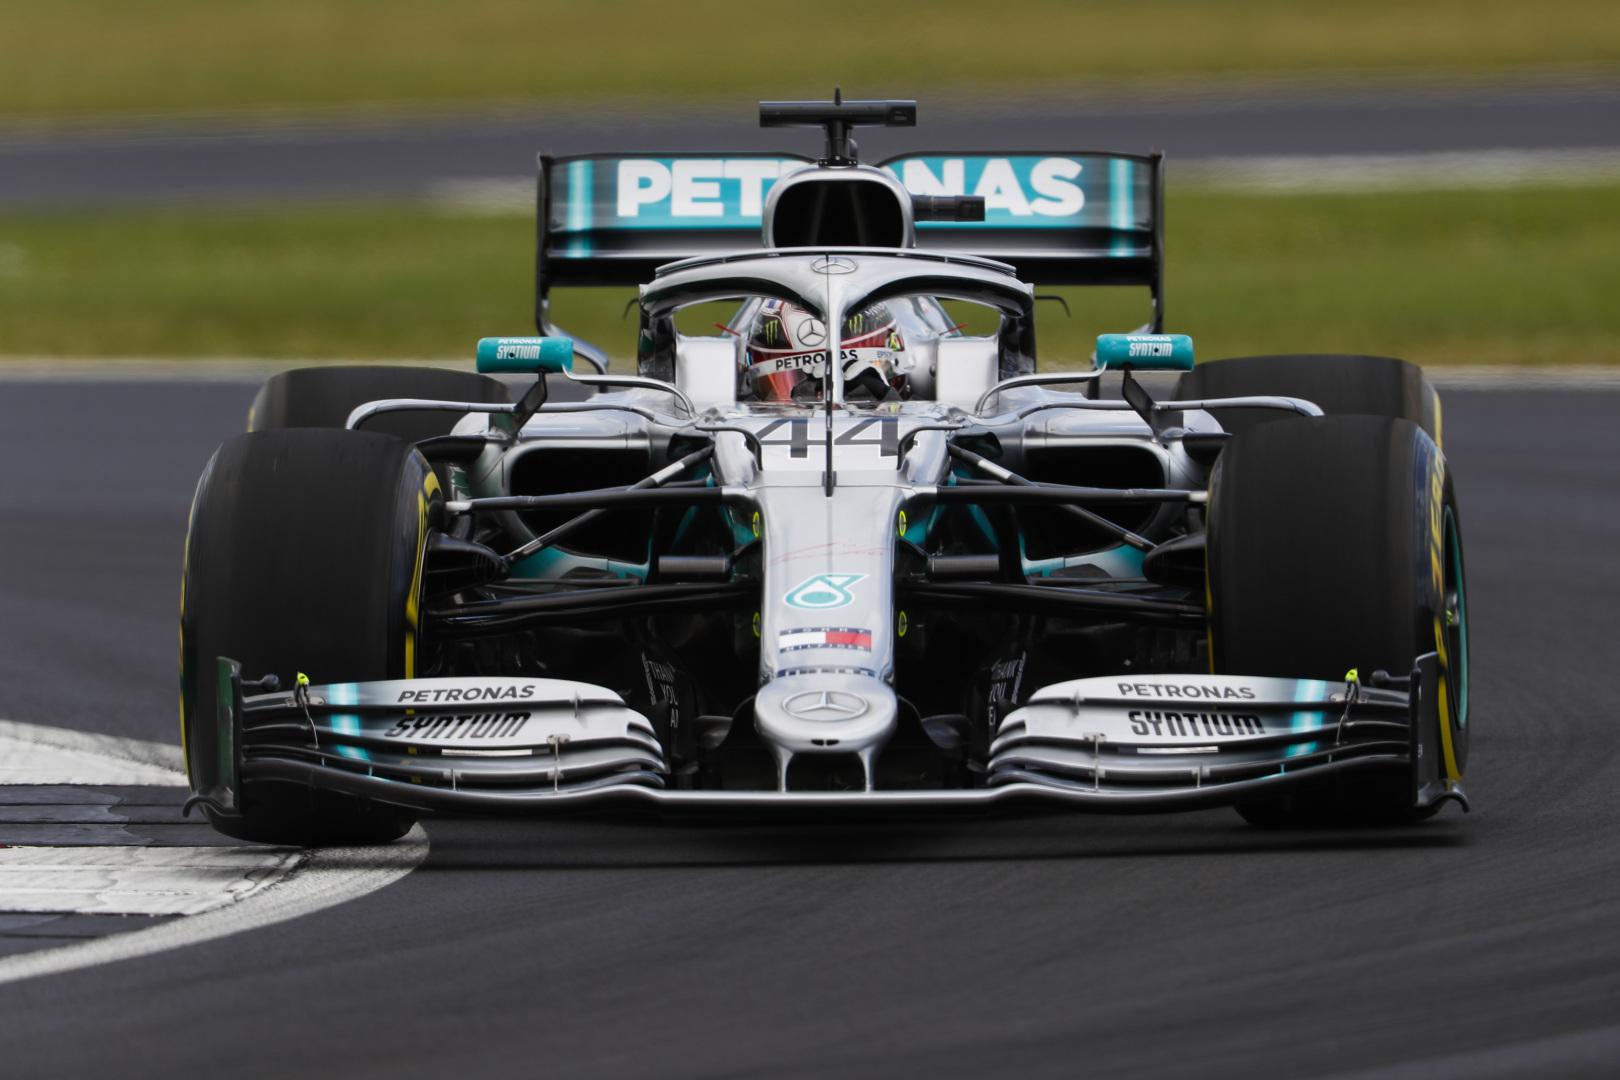 Mercedes announces F1 launch/shakedown date - Speedcafe